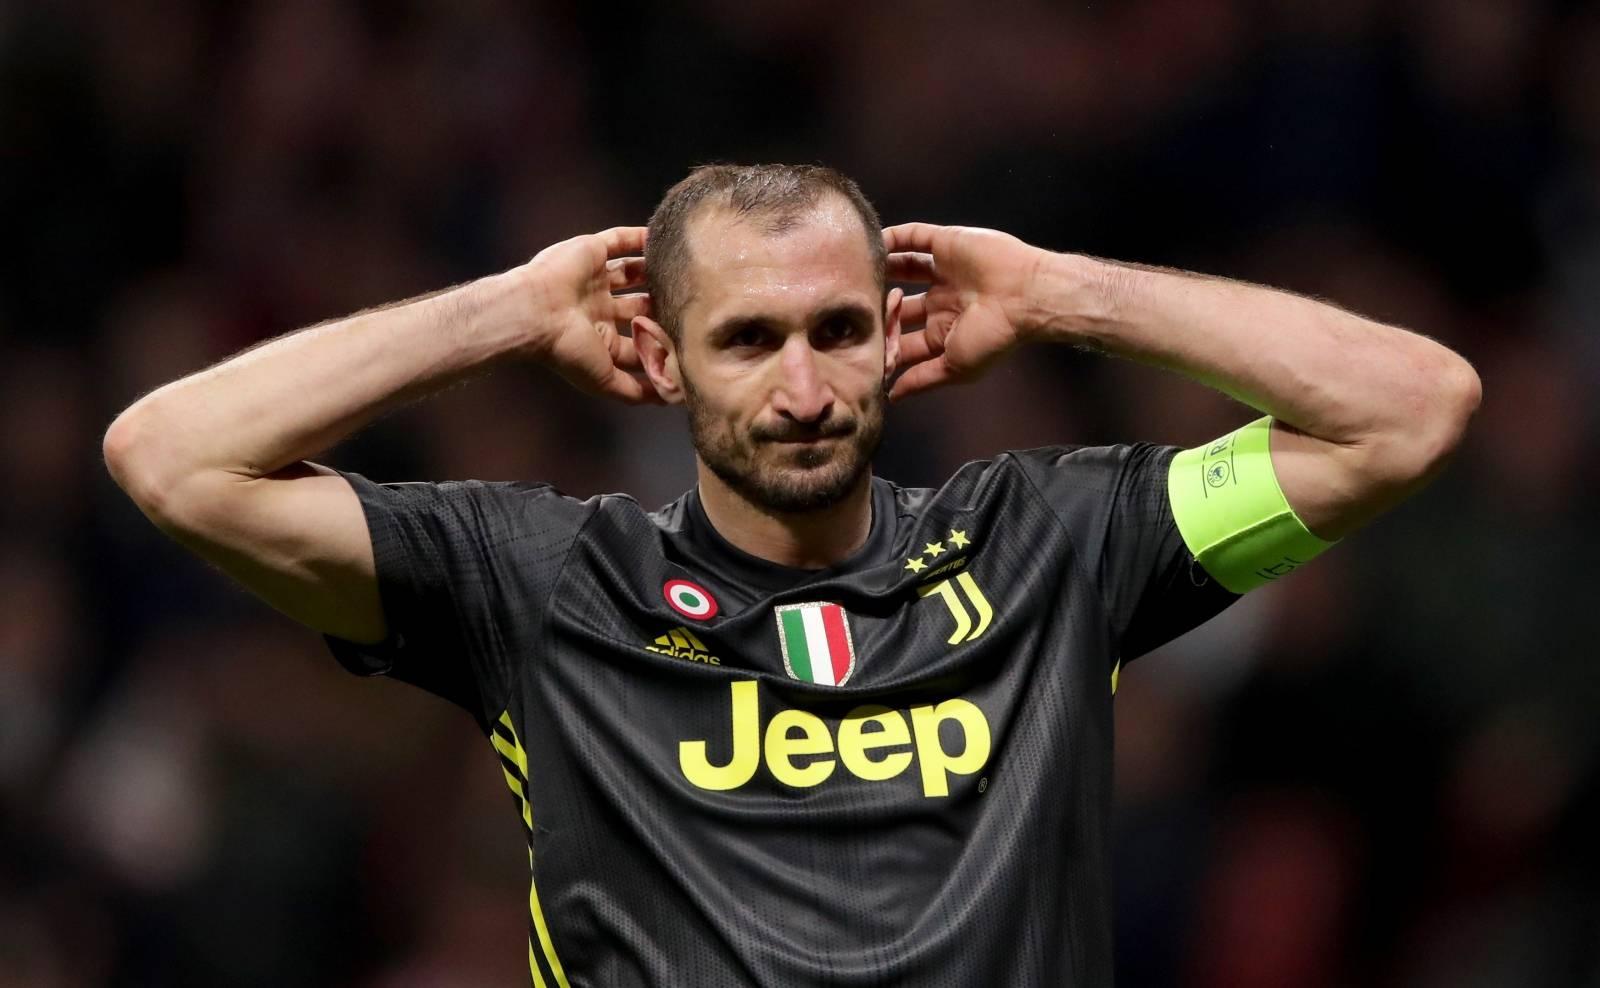 Atletico Madrid v Juventus - UEFA Champions League - Round of 16 - First Leg - Wanda Metropolitano Stadium